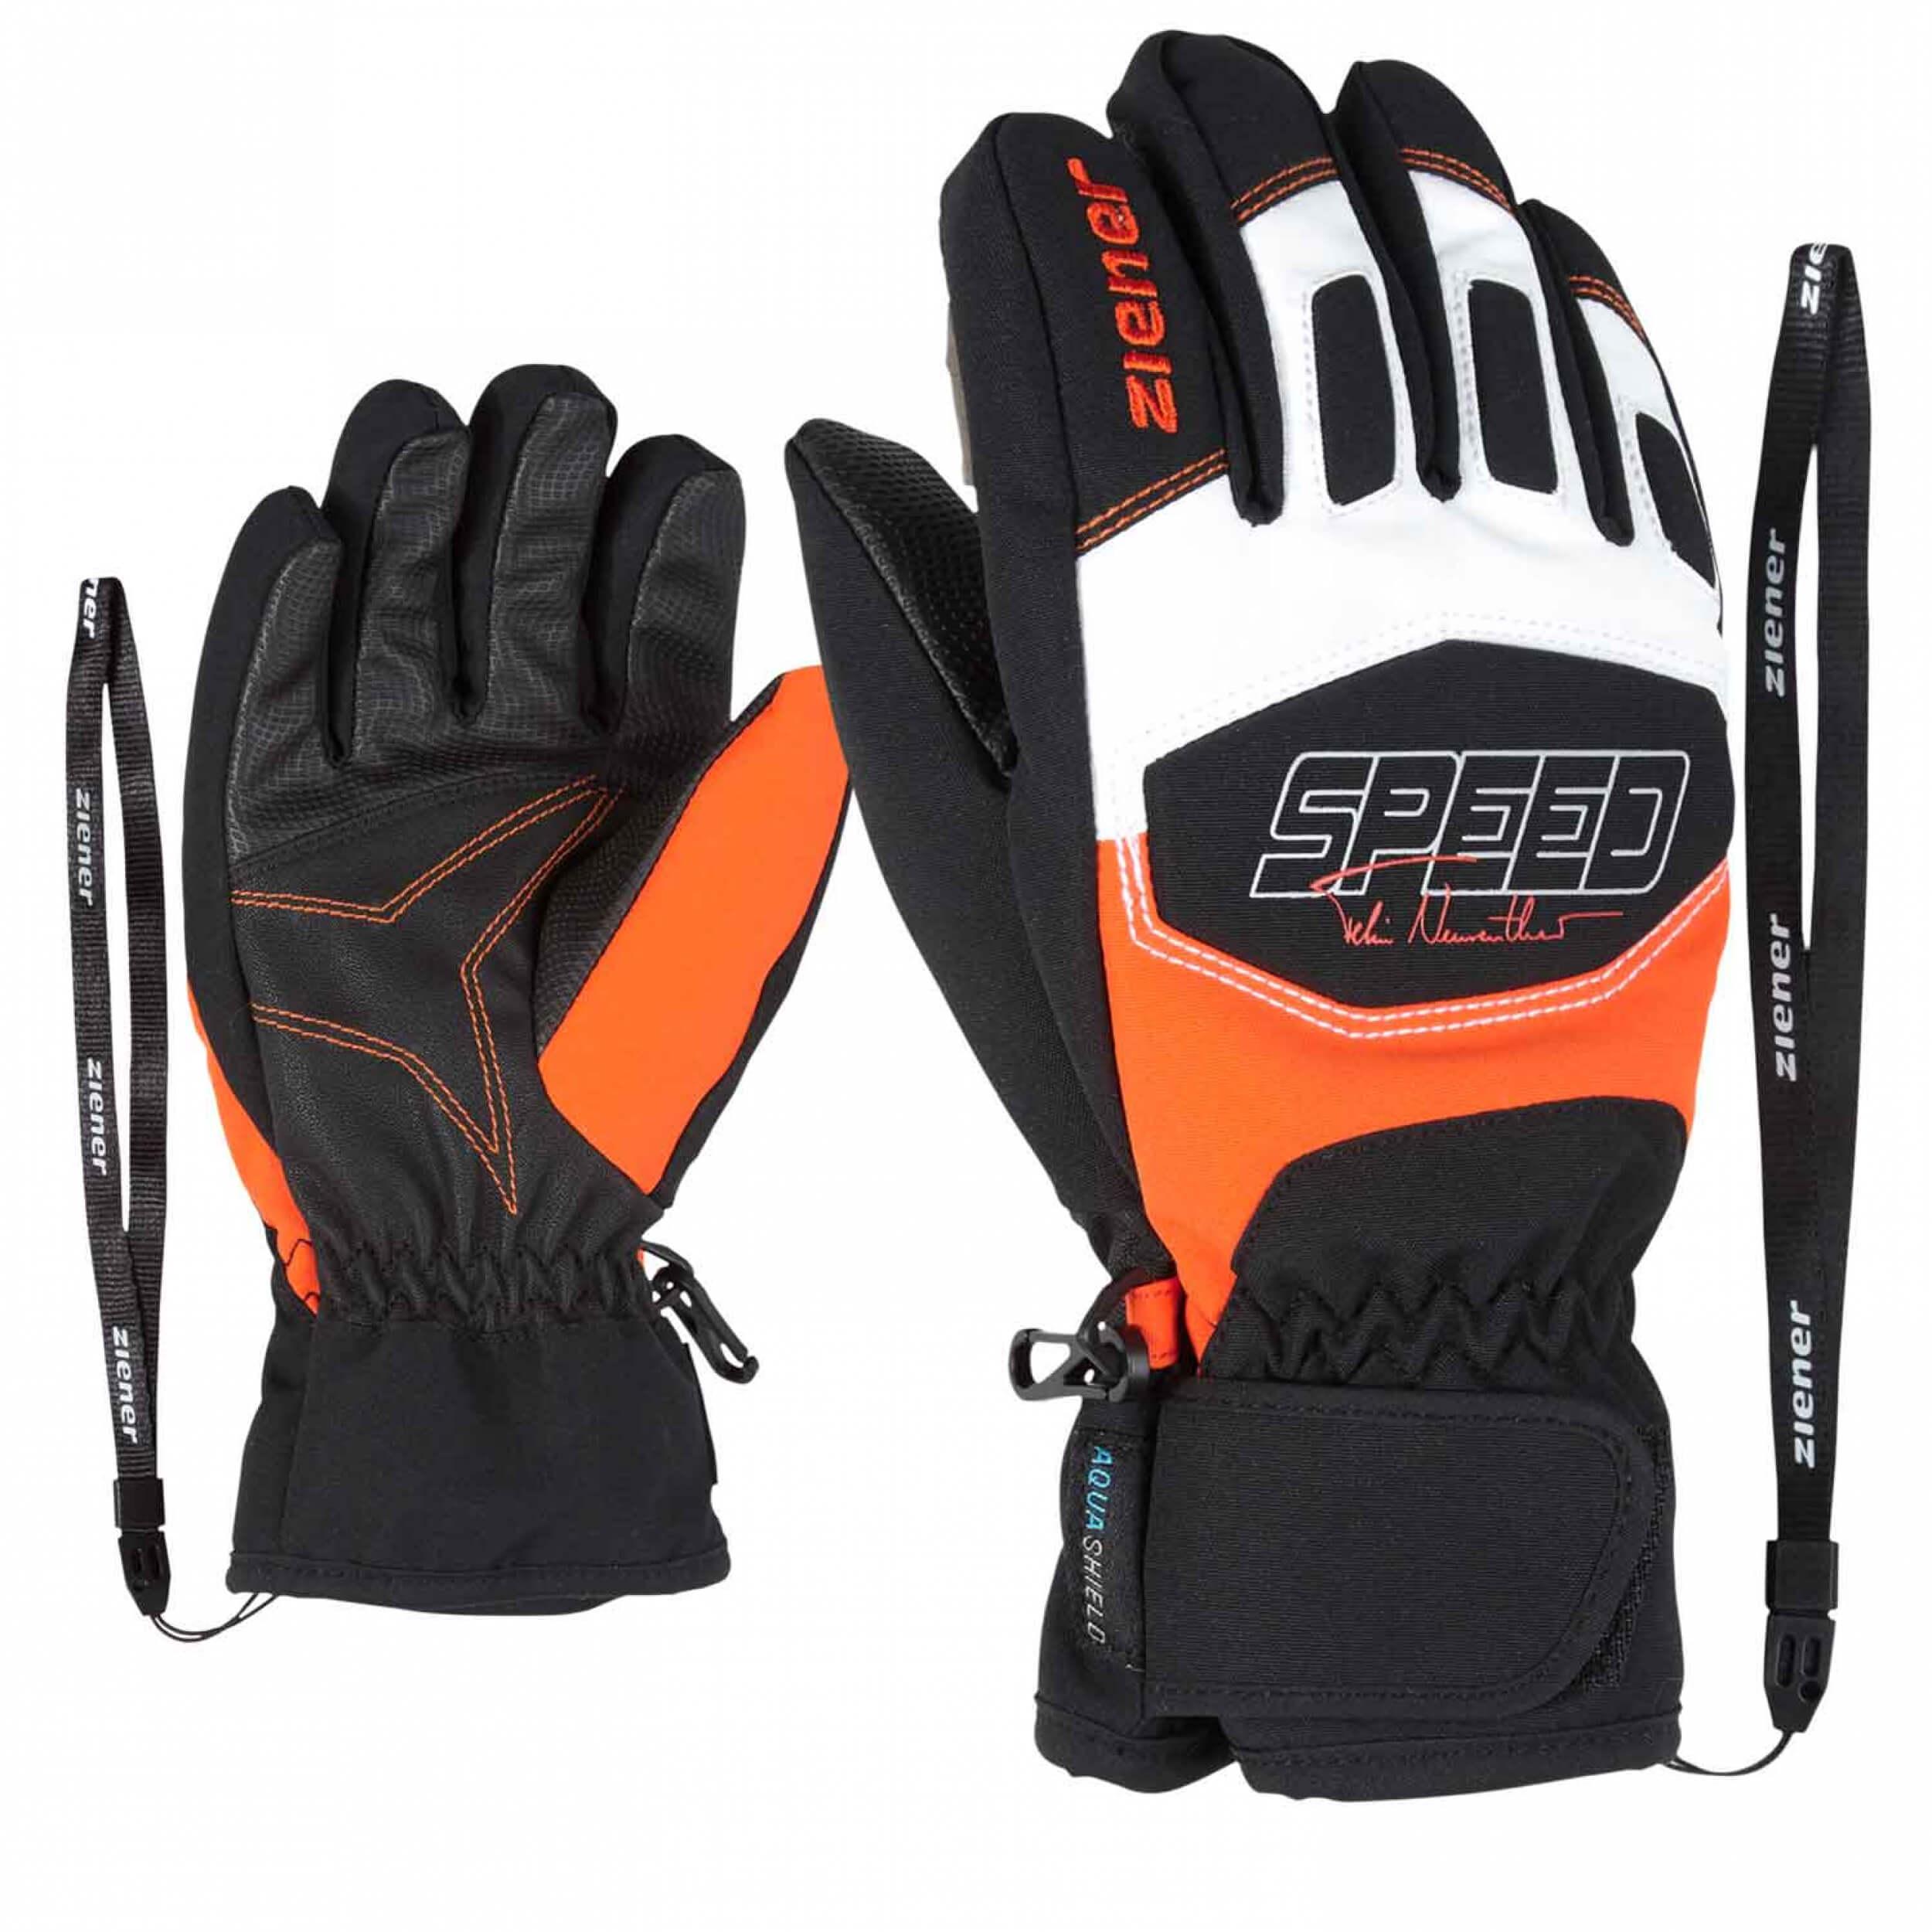 ZIENER Kinder Ski-Handschuhe Leedim AQUASHIELD orange 187